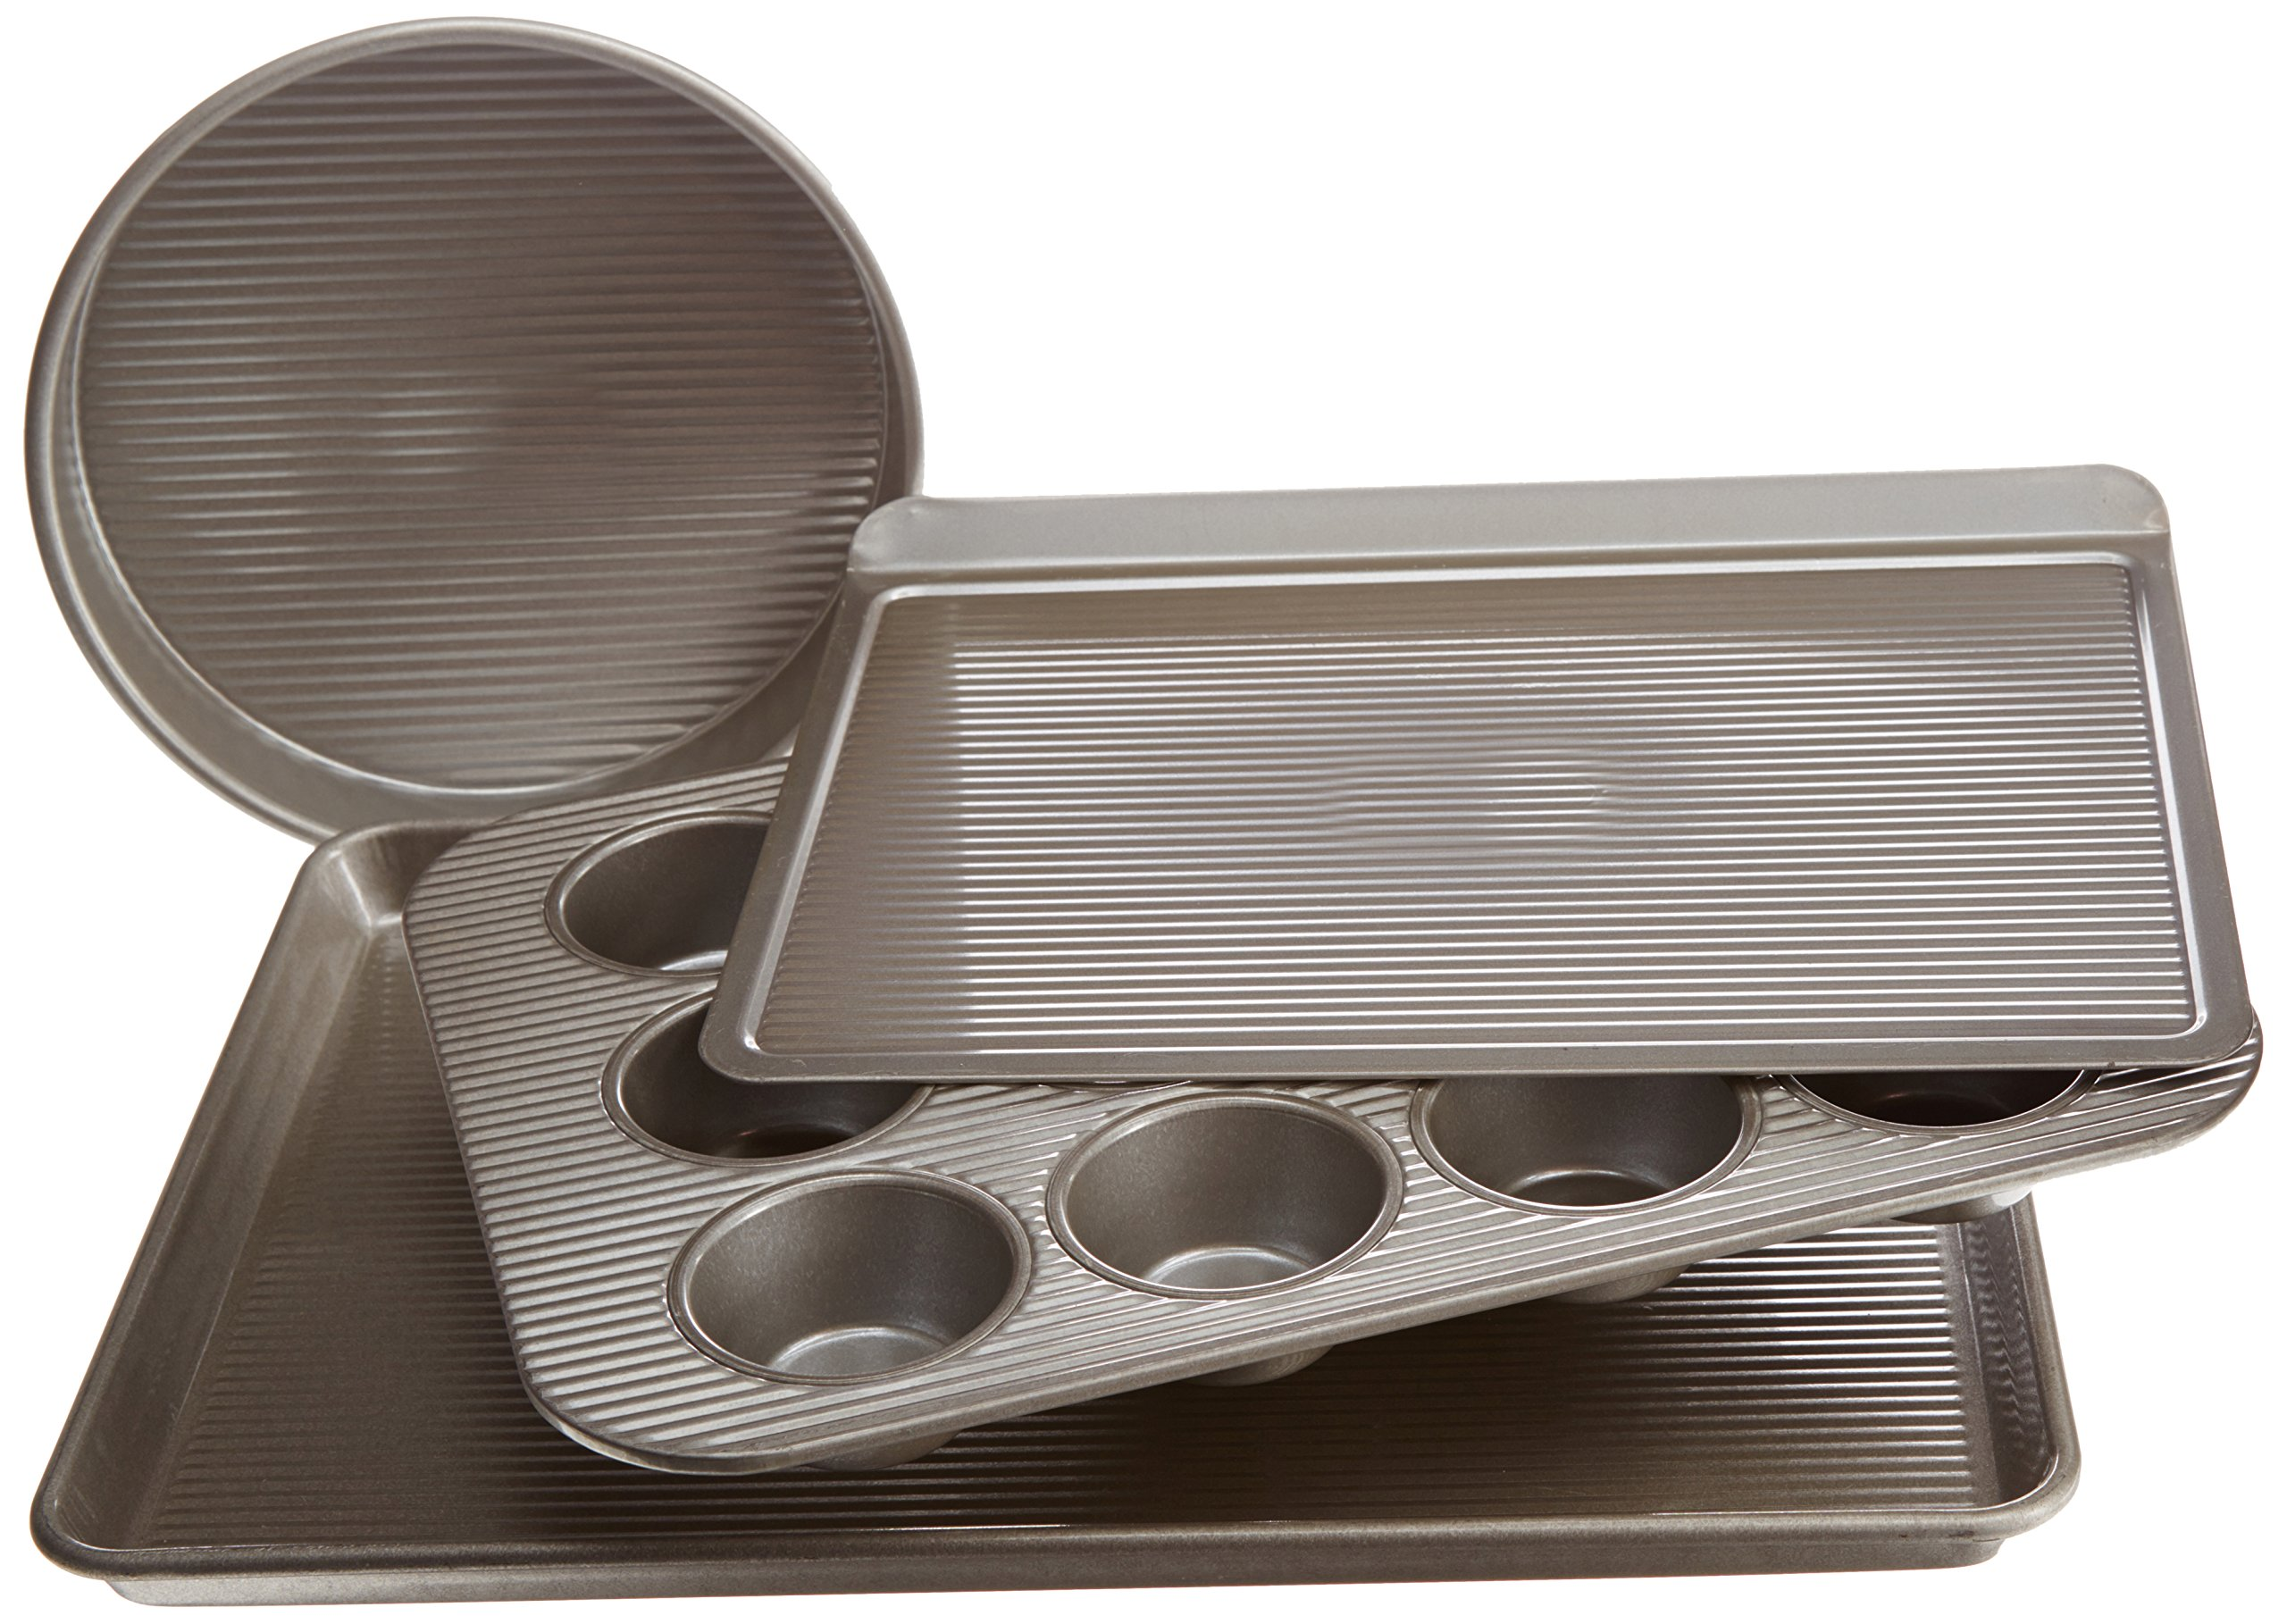 USA Pan Bakeware Aluminized Steel 4 Piece Essential Baker Pan Set, 12 Cup Muffin Pan, Round Cake Pan, Cookie Sheet and Half Sheet